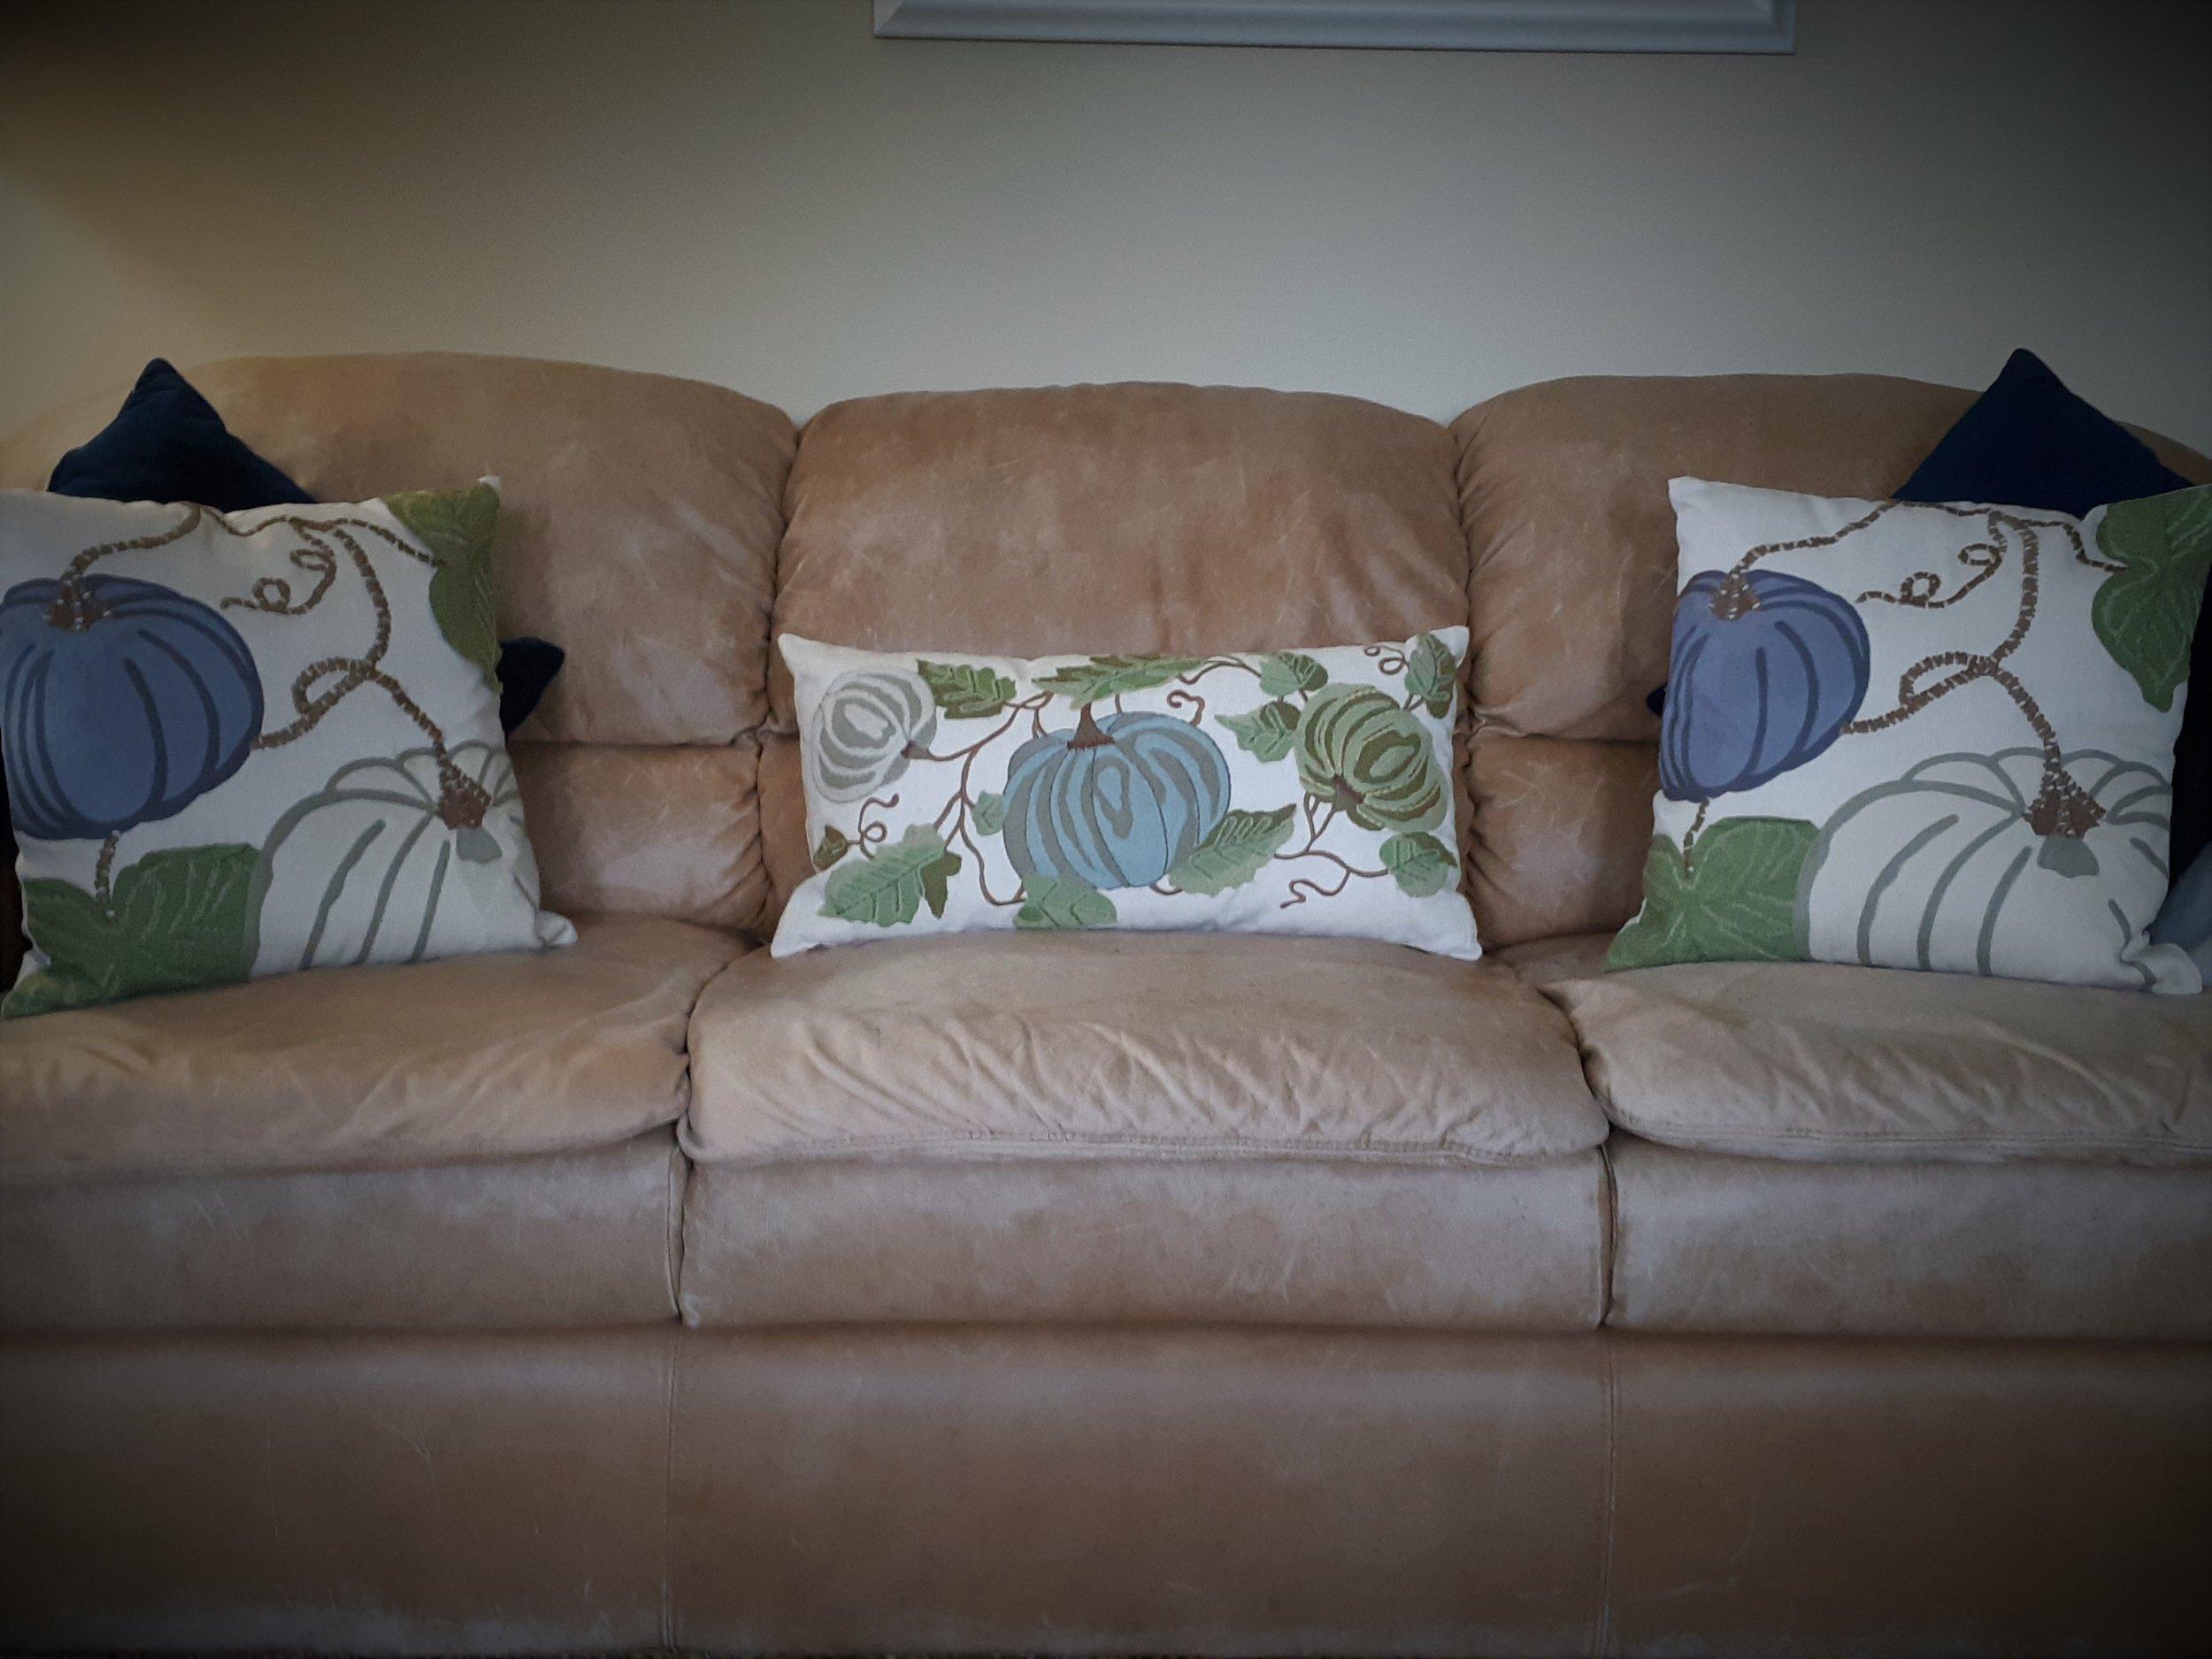 Fall Pillows on Sofa.jpg